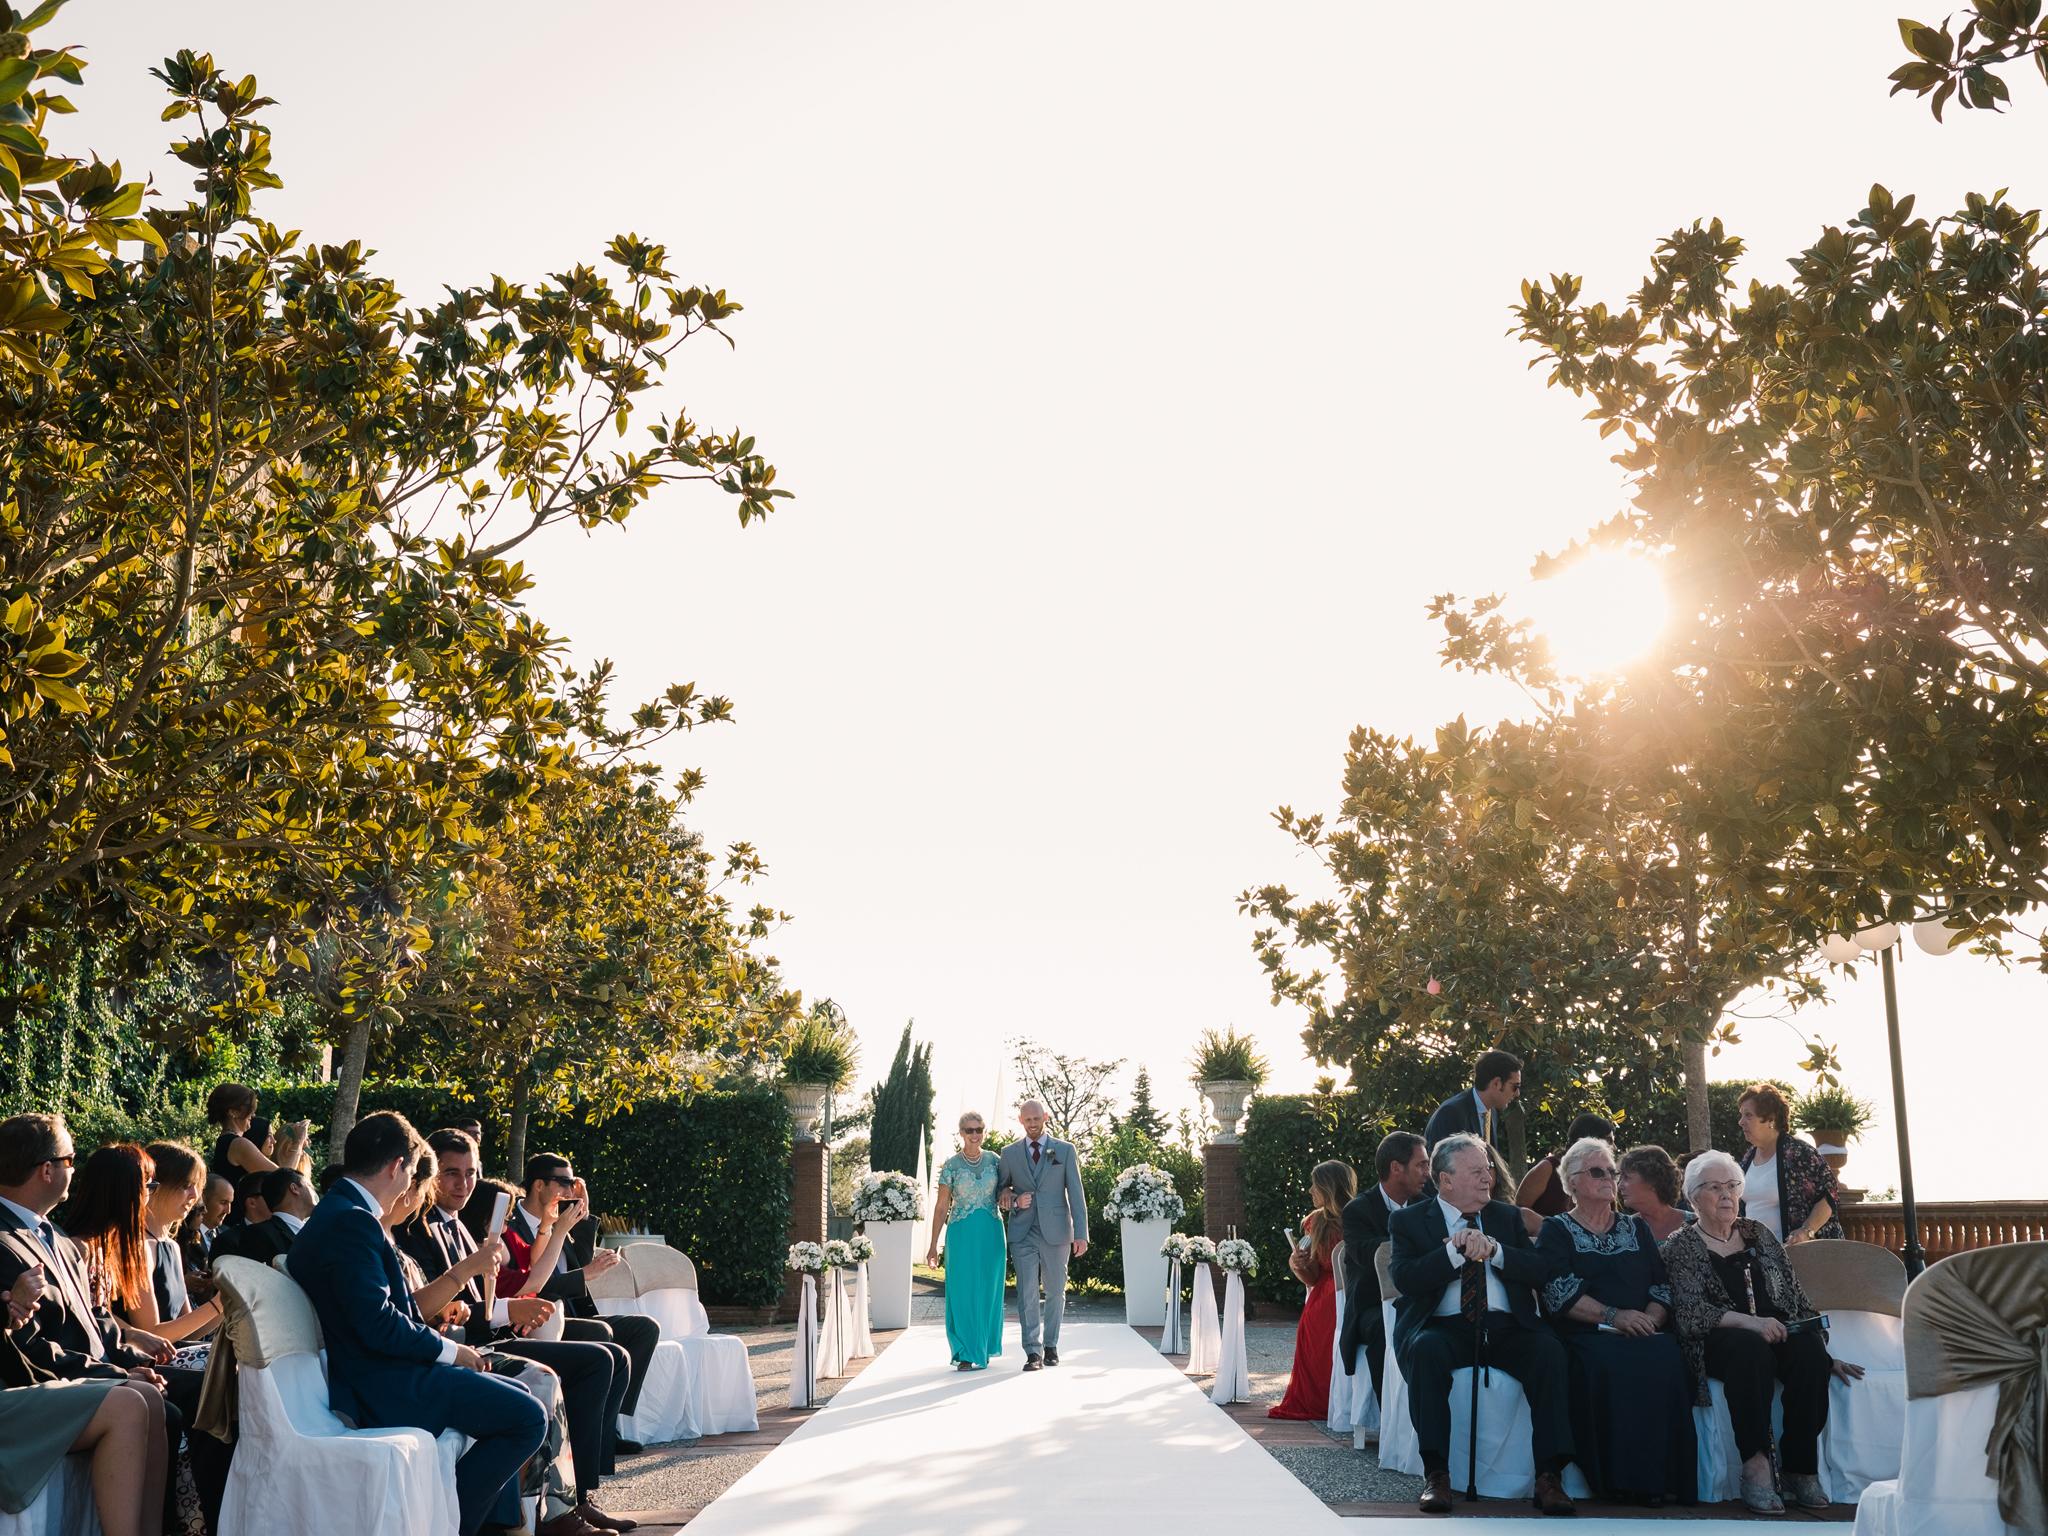 fotografia-boda-mas-sant-llei0028.jpg